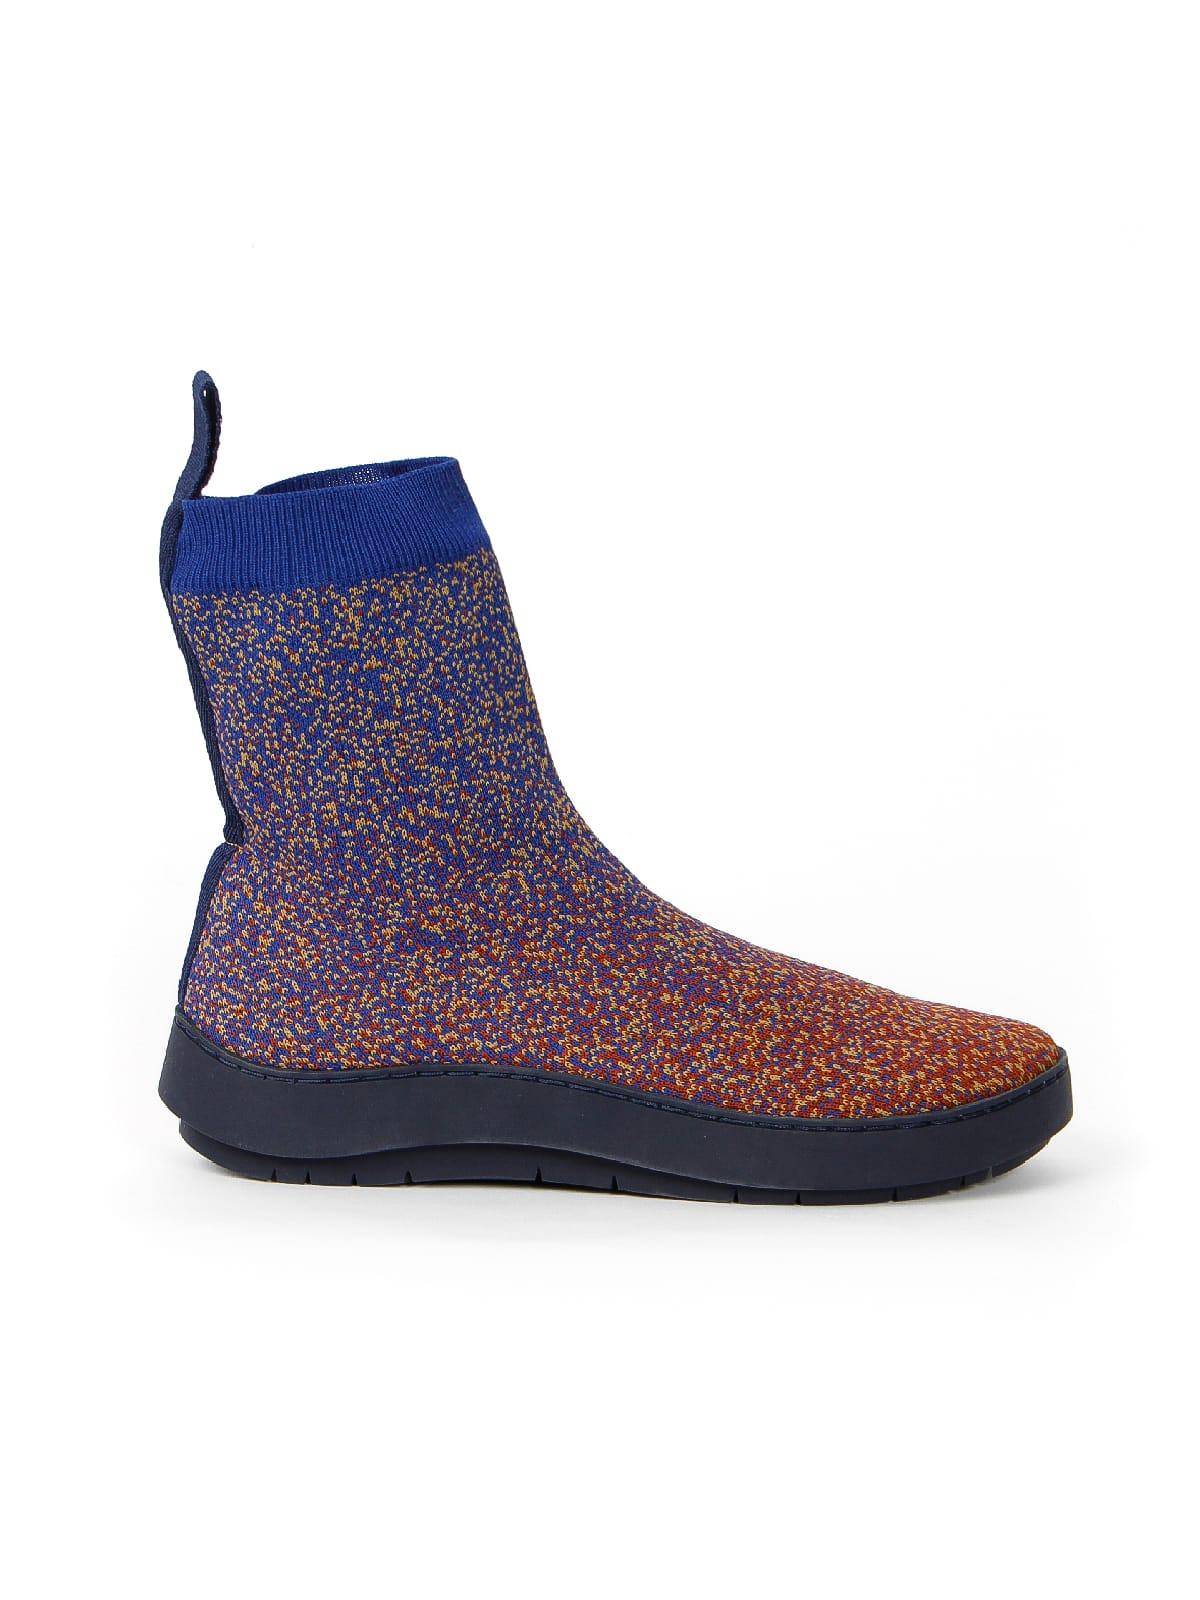 3D knitted sockboot Sparkle foxy rechts